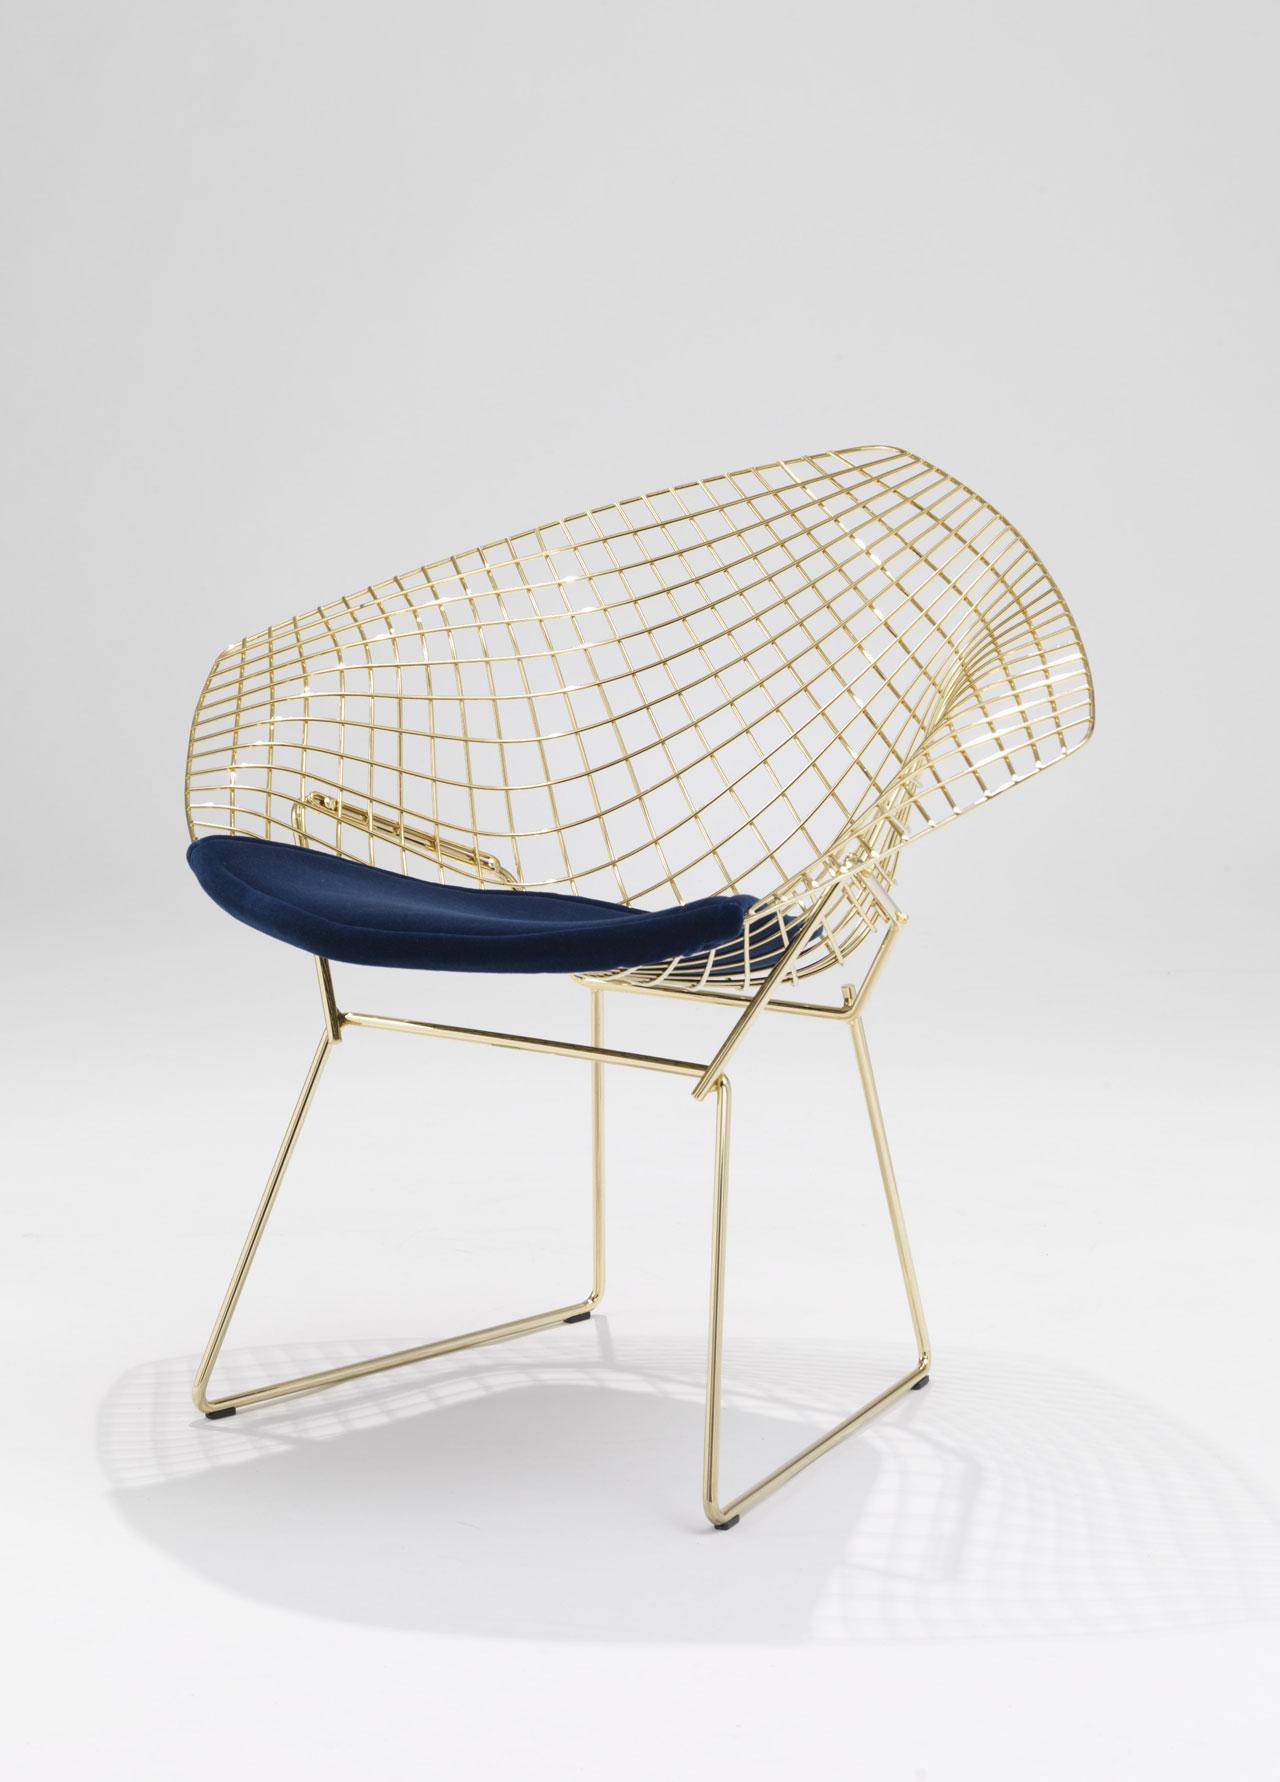 0a_diamond_chair-gold-by-harry-bertoia_0216_mdw16_yatzer.jpg